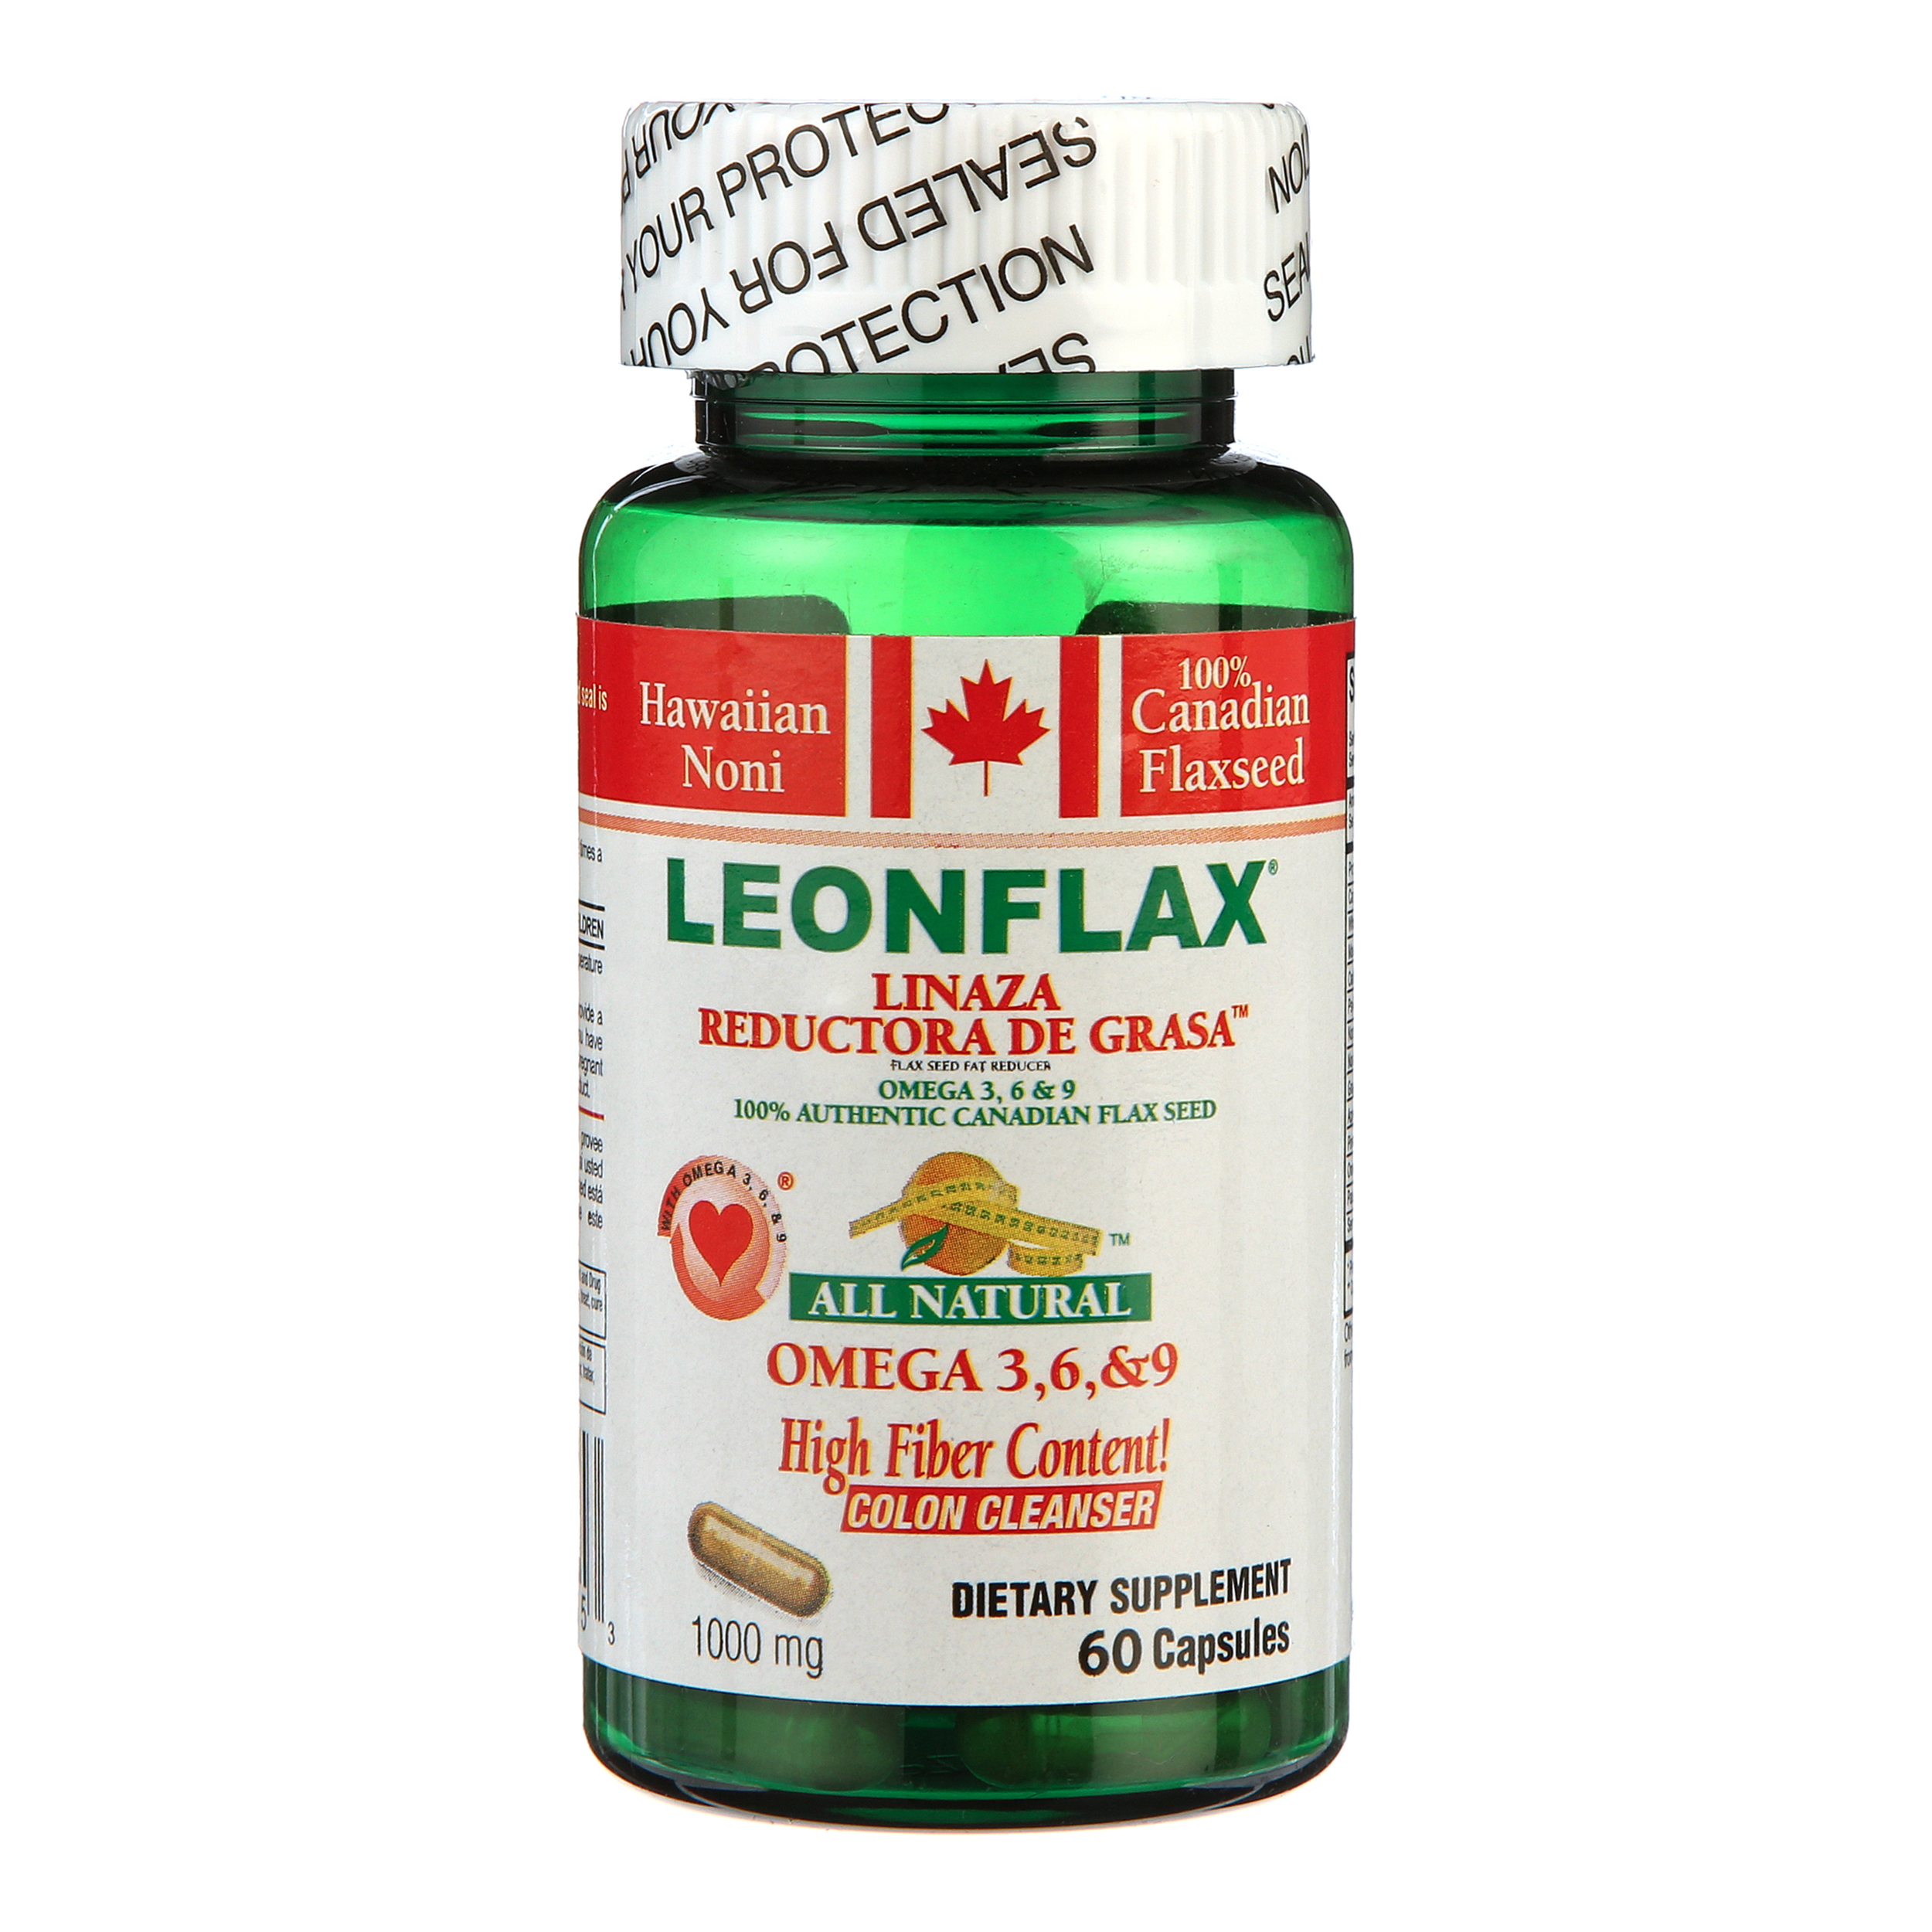 Leonflax Omega 3 6 9 Fiber Capsules 120 Ct Walmart Com